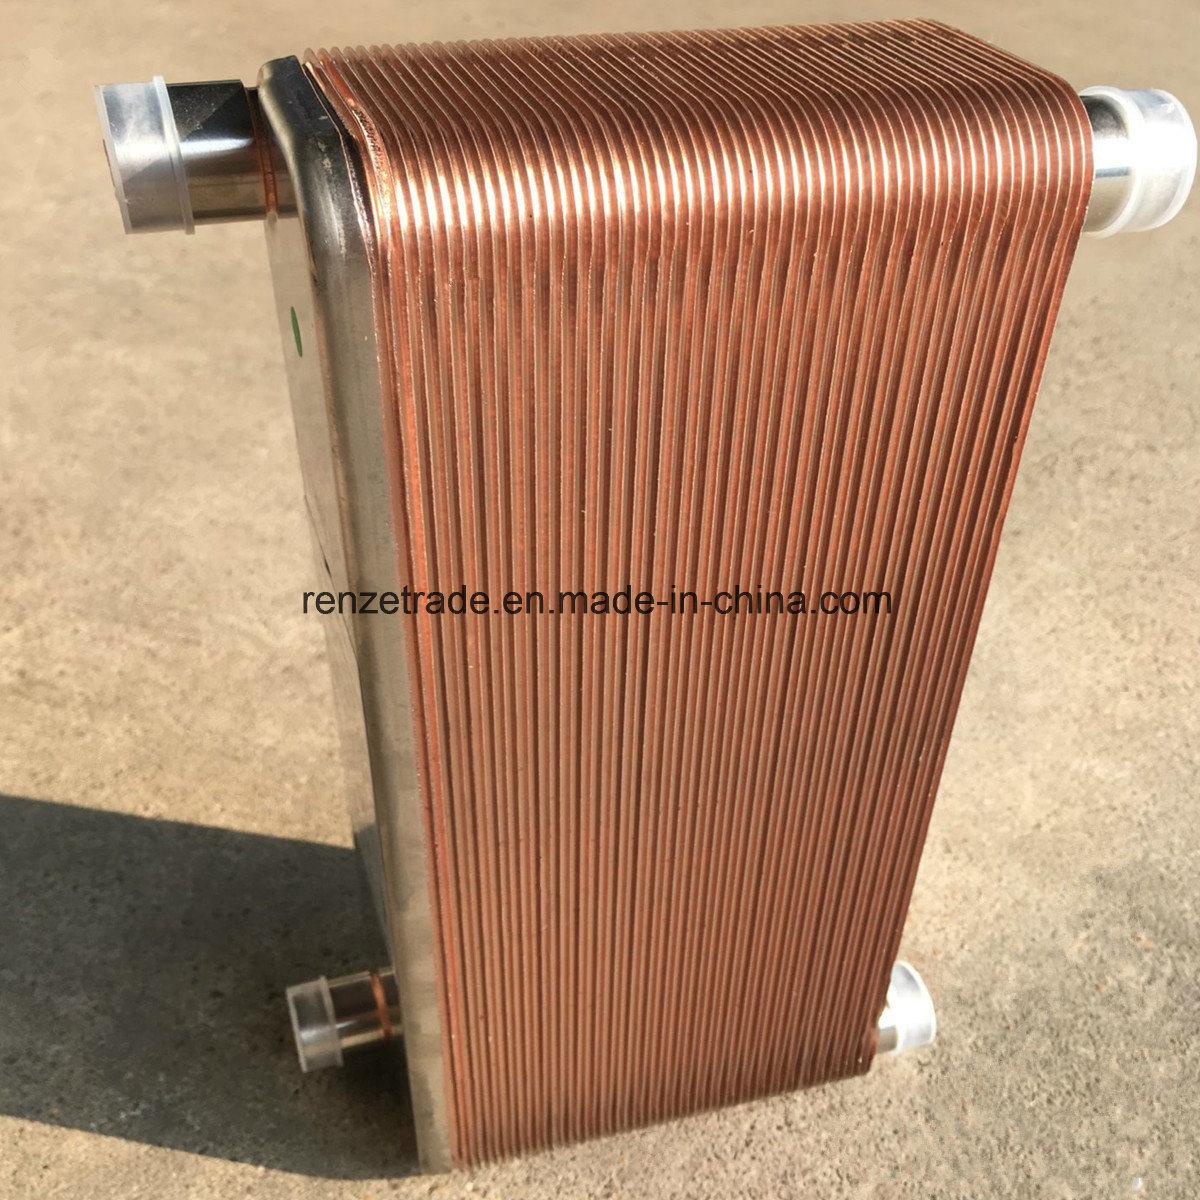 High Quality Water/Steam/Refrigerant Condensercopper Brazed Plate Type Heat Exchanger